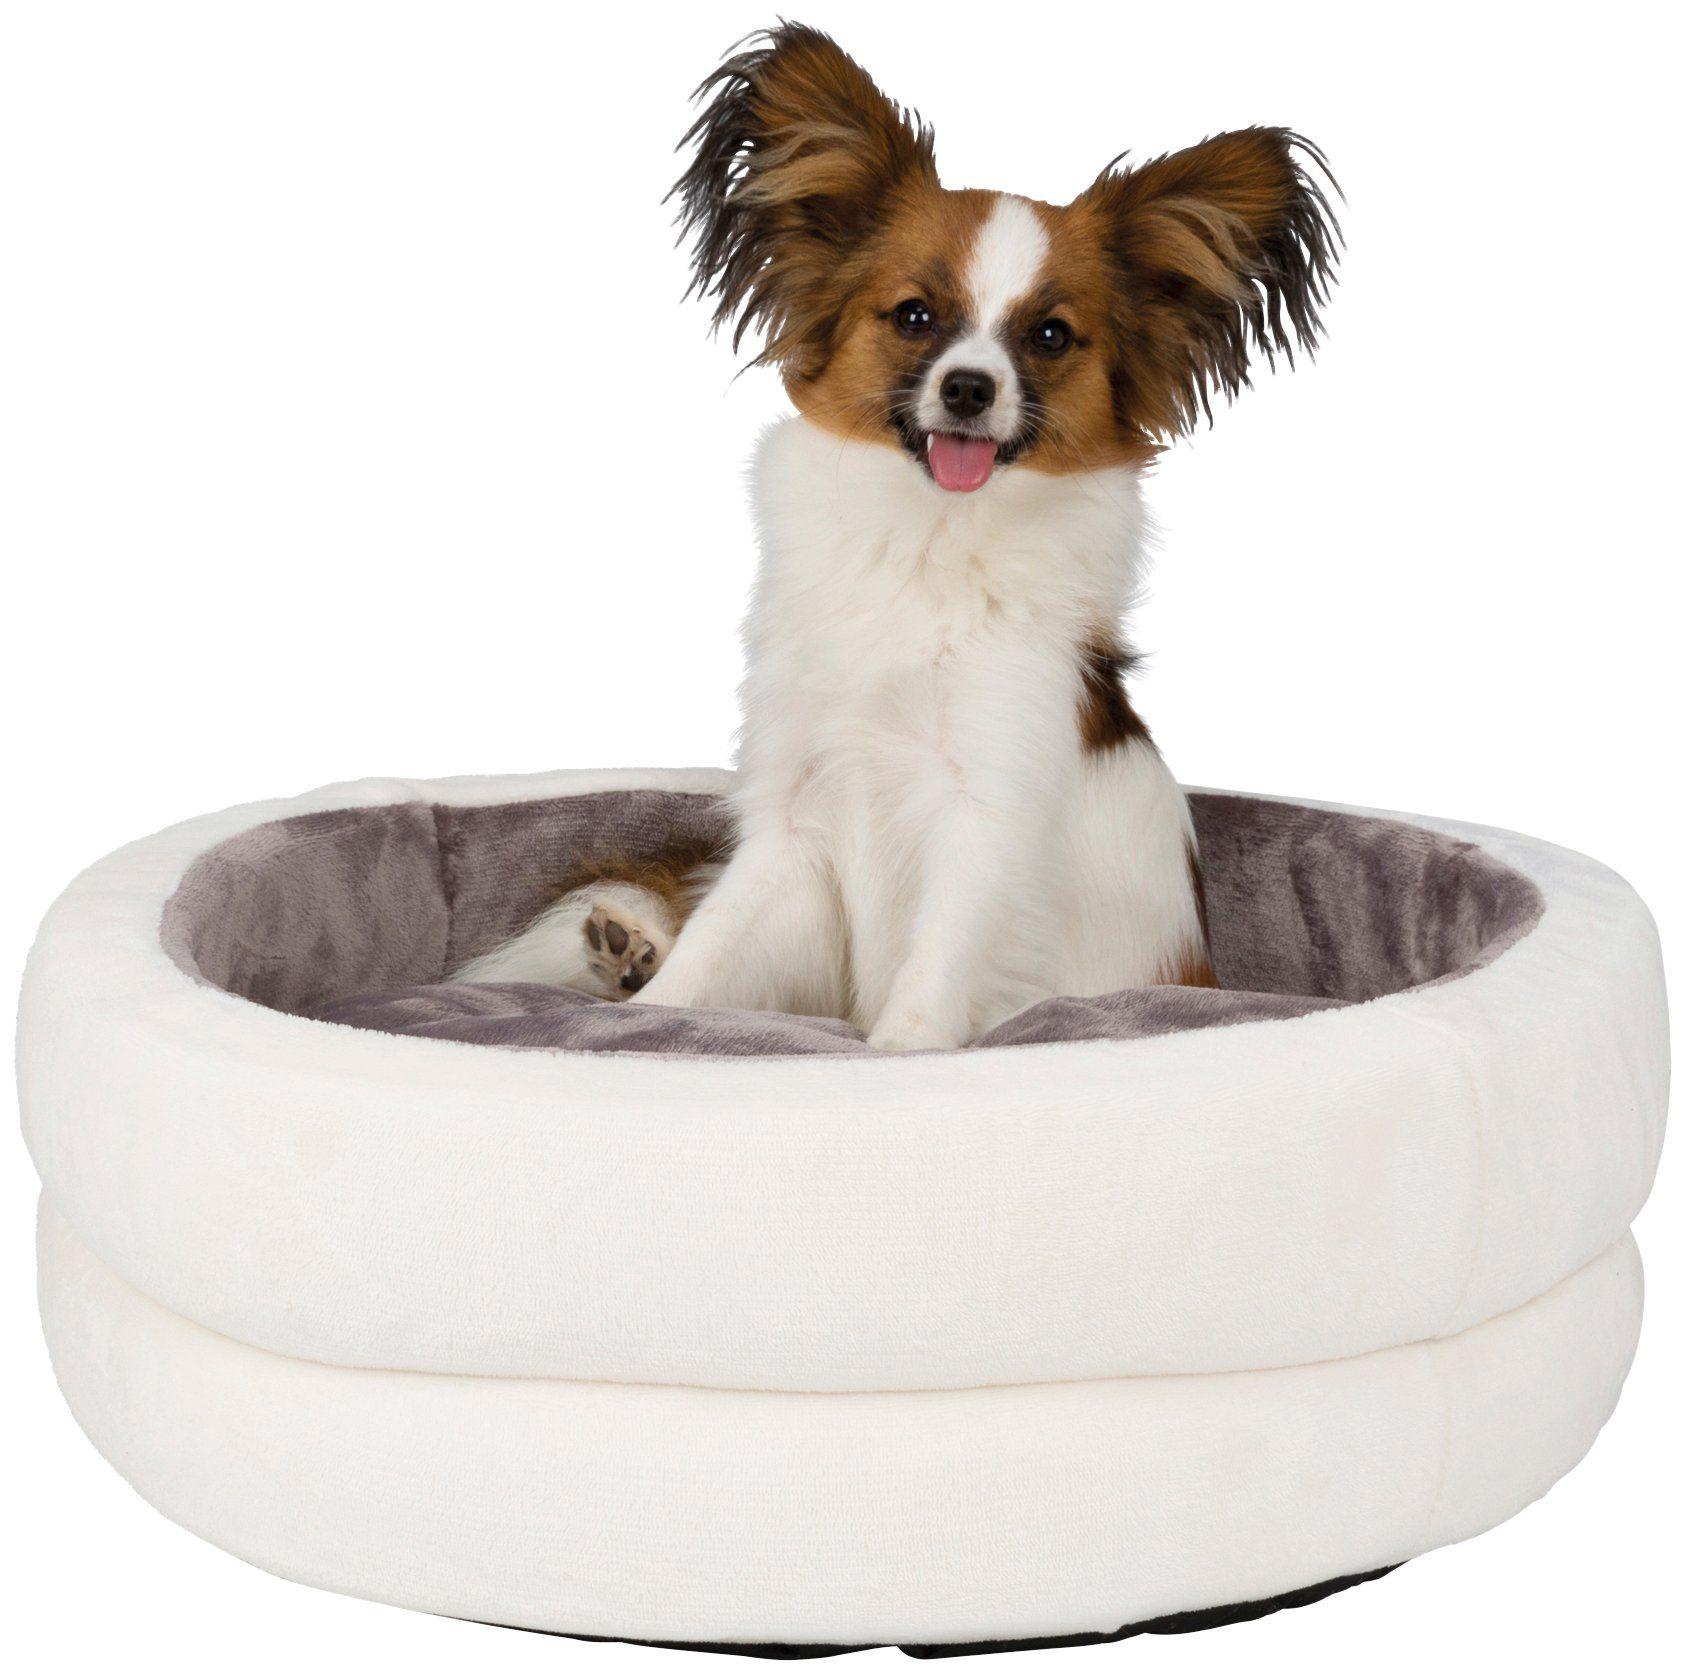 TRIXIE Hundebett und Katzenbett »Levi«, Ø: 55 cm, creme/grau